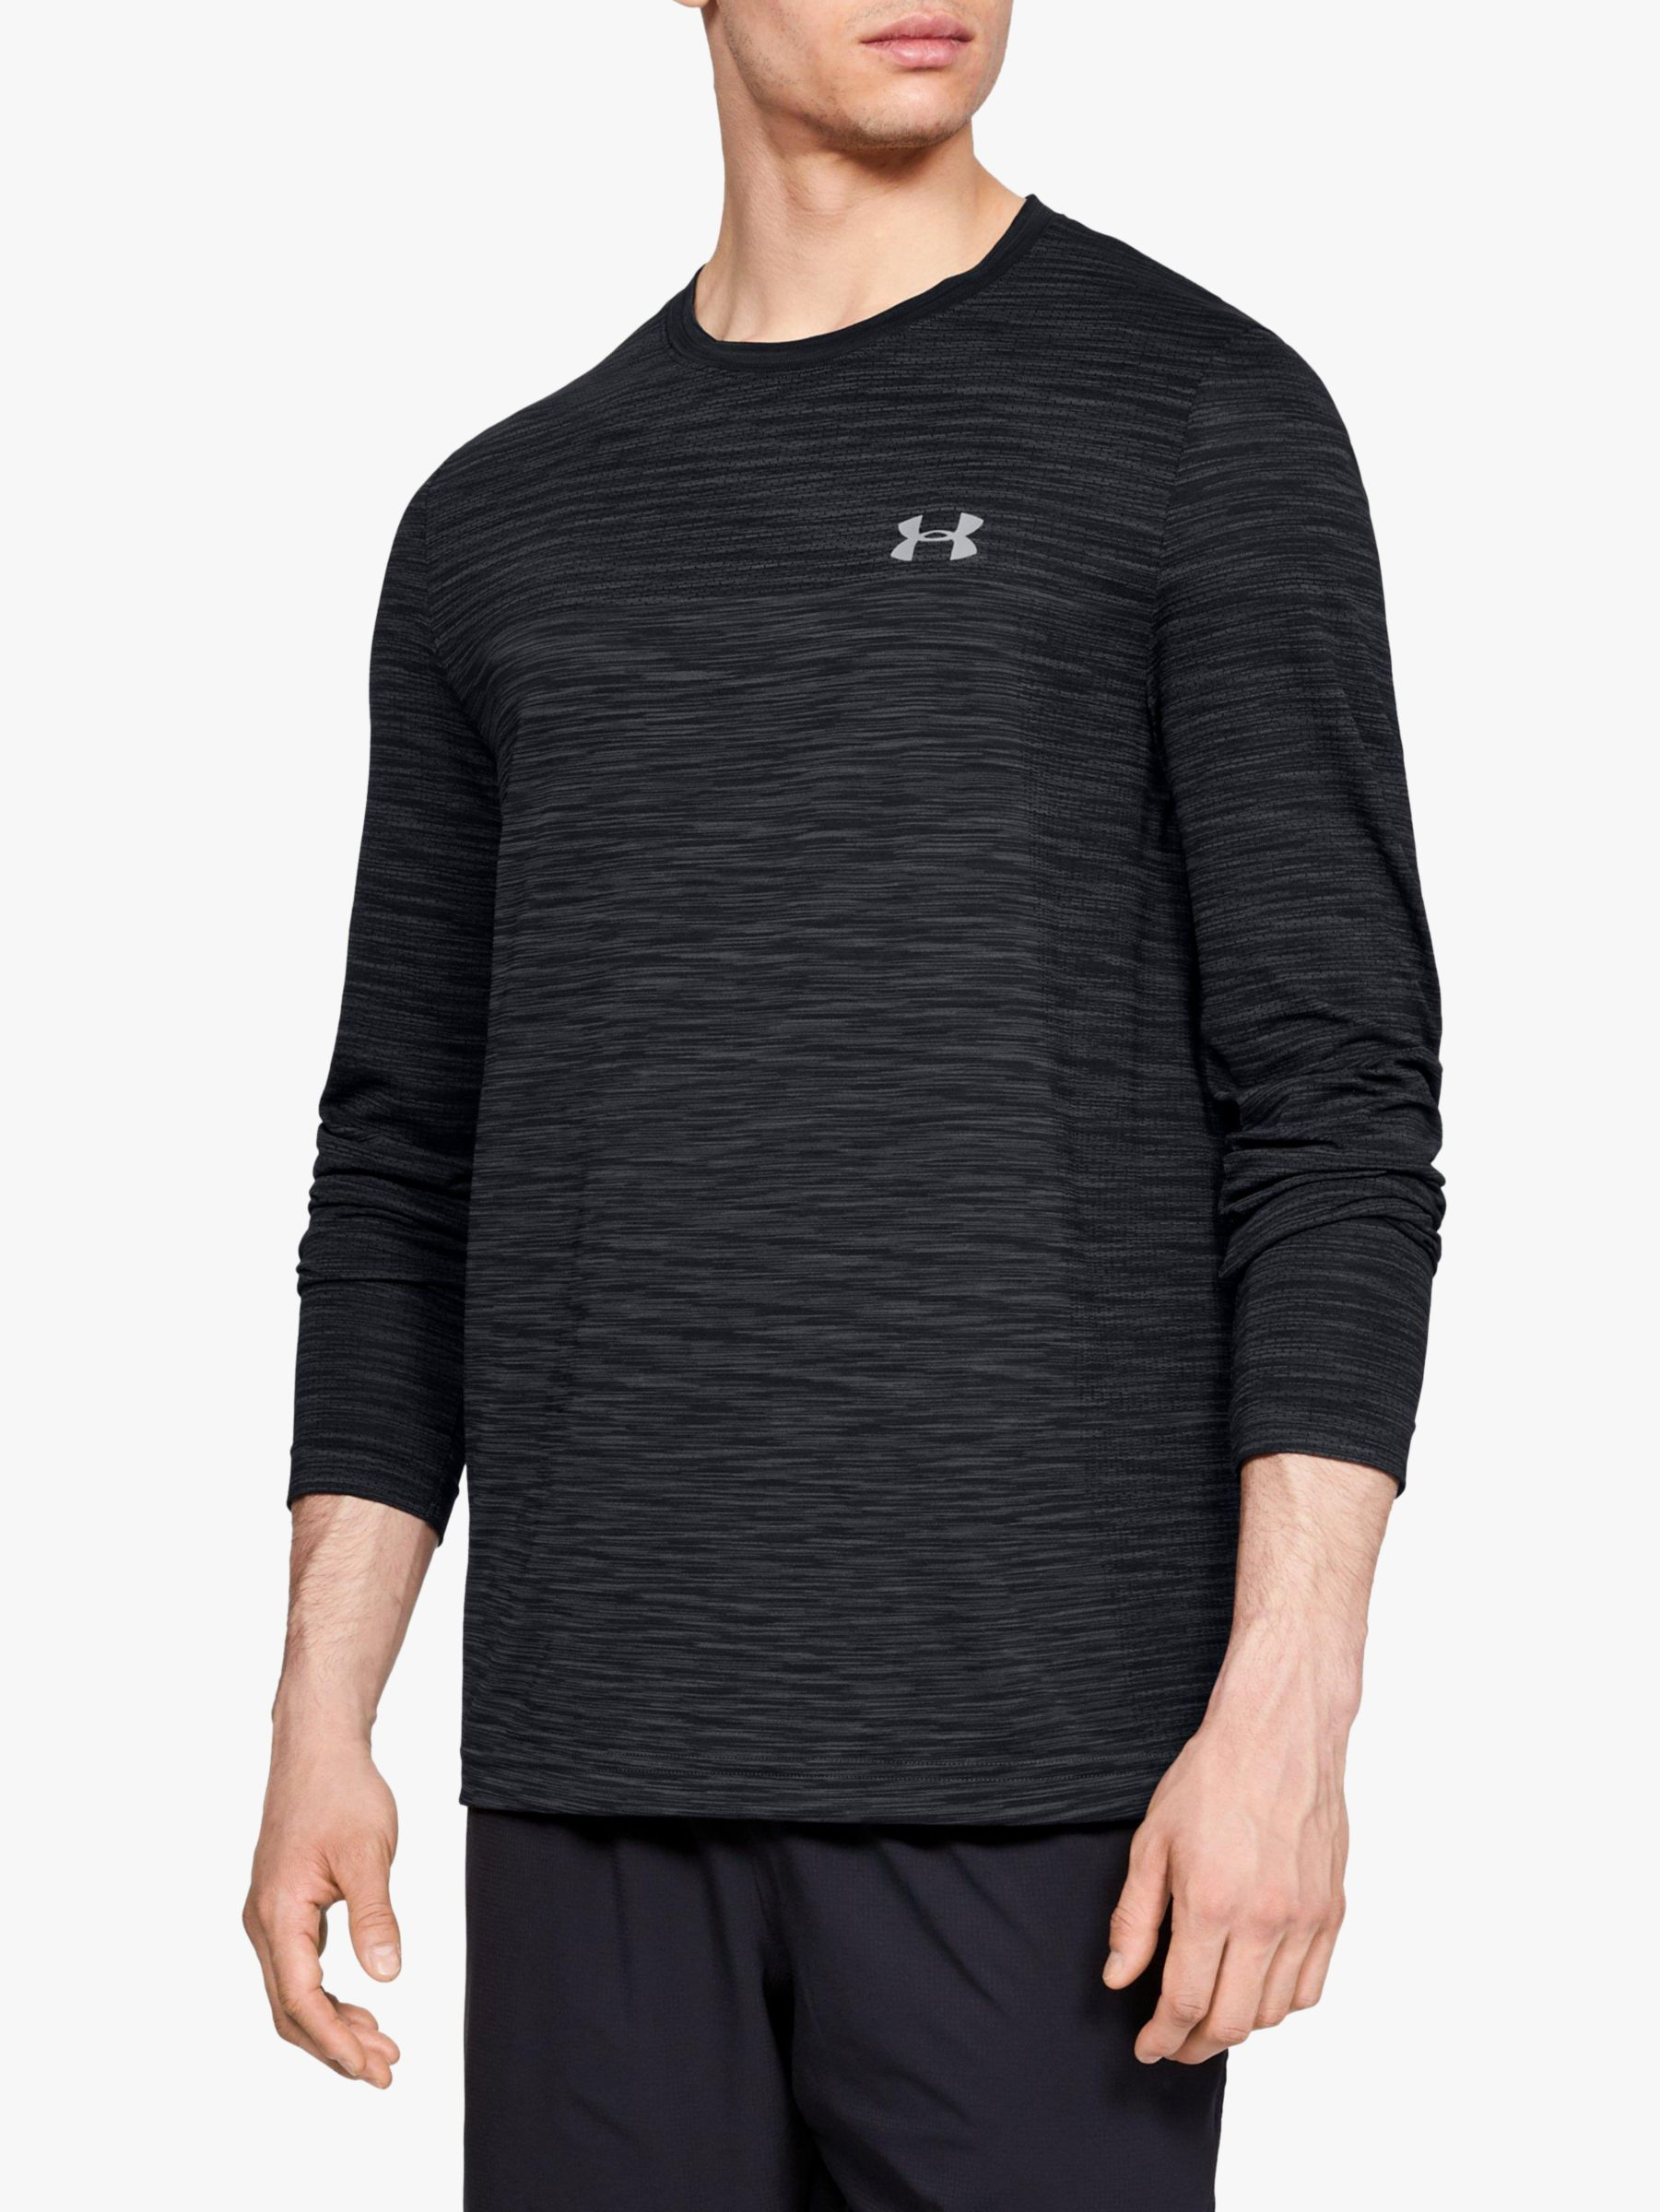 Under Armour Vanish Mens Training Top Grey Camo Seamless Short Sleeve Gym Sports